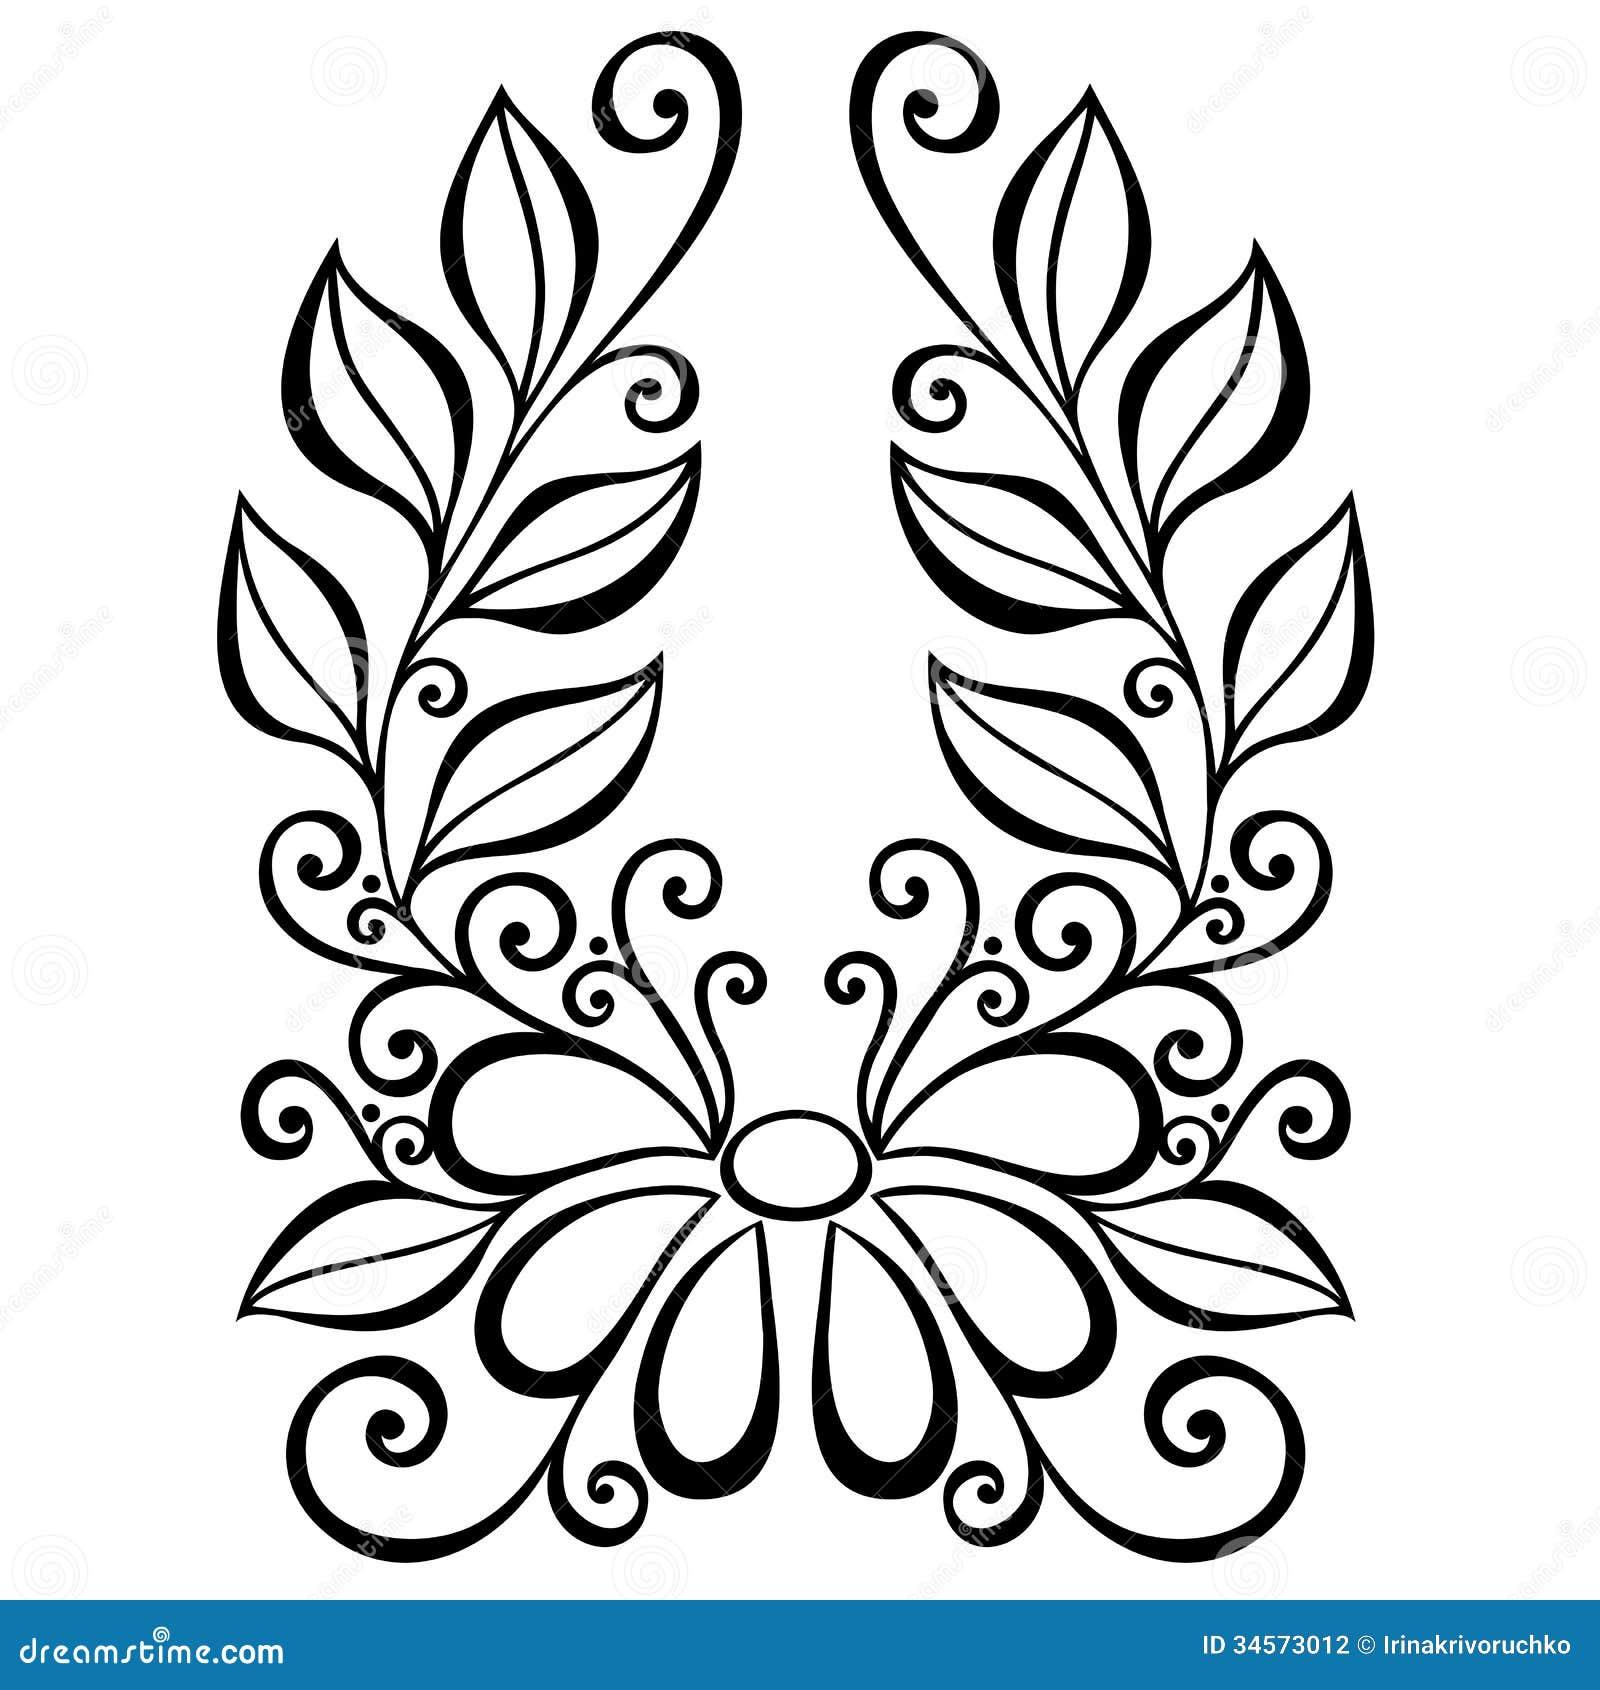 Nice Tattoos Designs On Paper